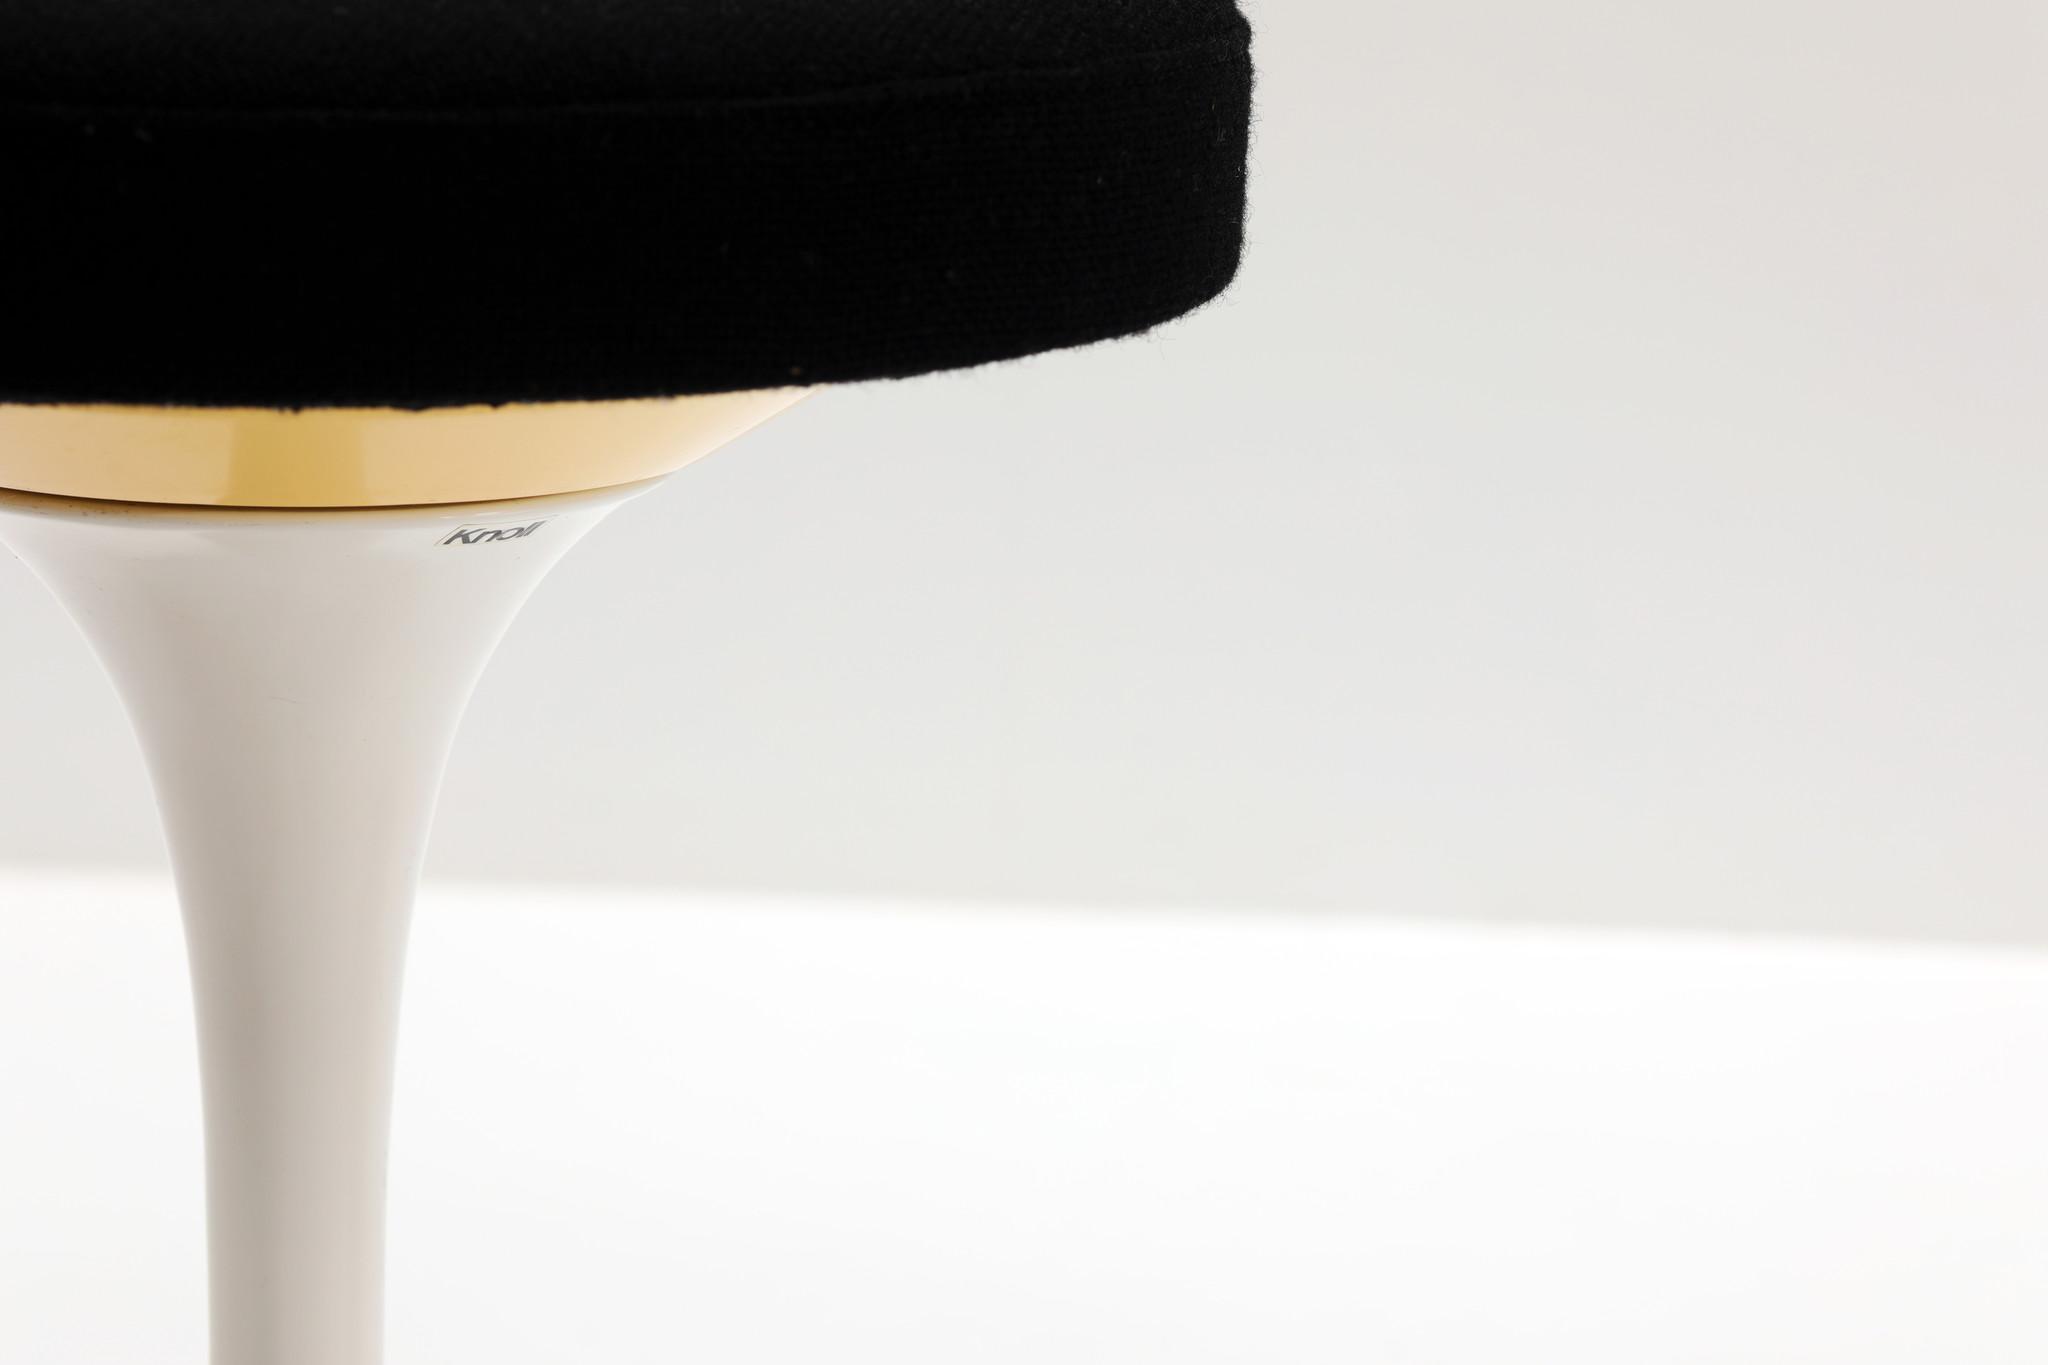 2 TULIP STOOLS BY EERO SAARINEN FOR KNOLL INTERNATIONAL